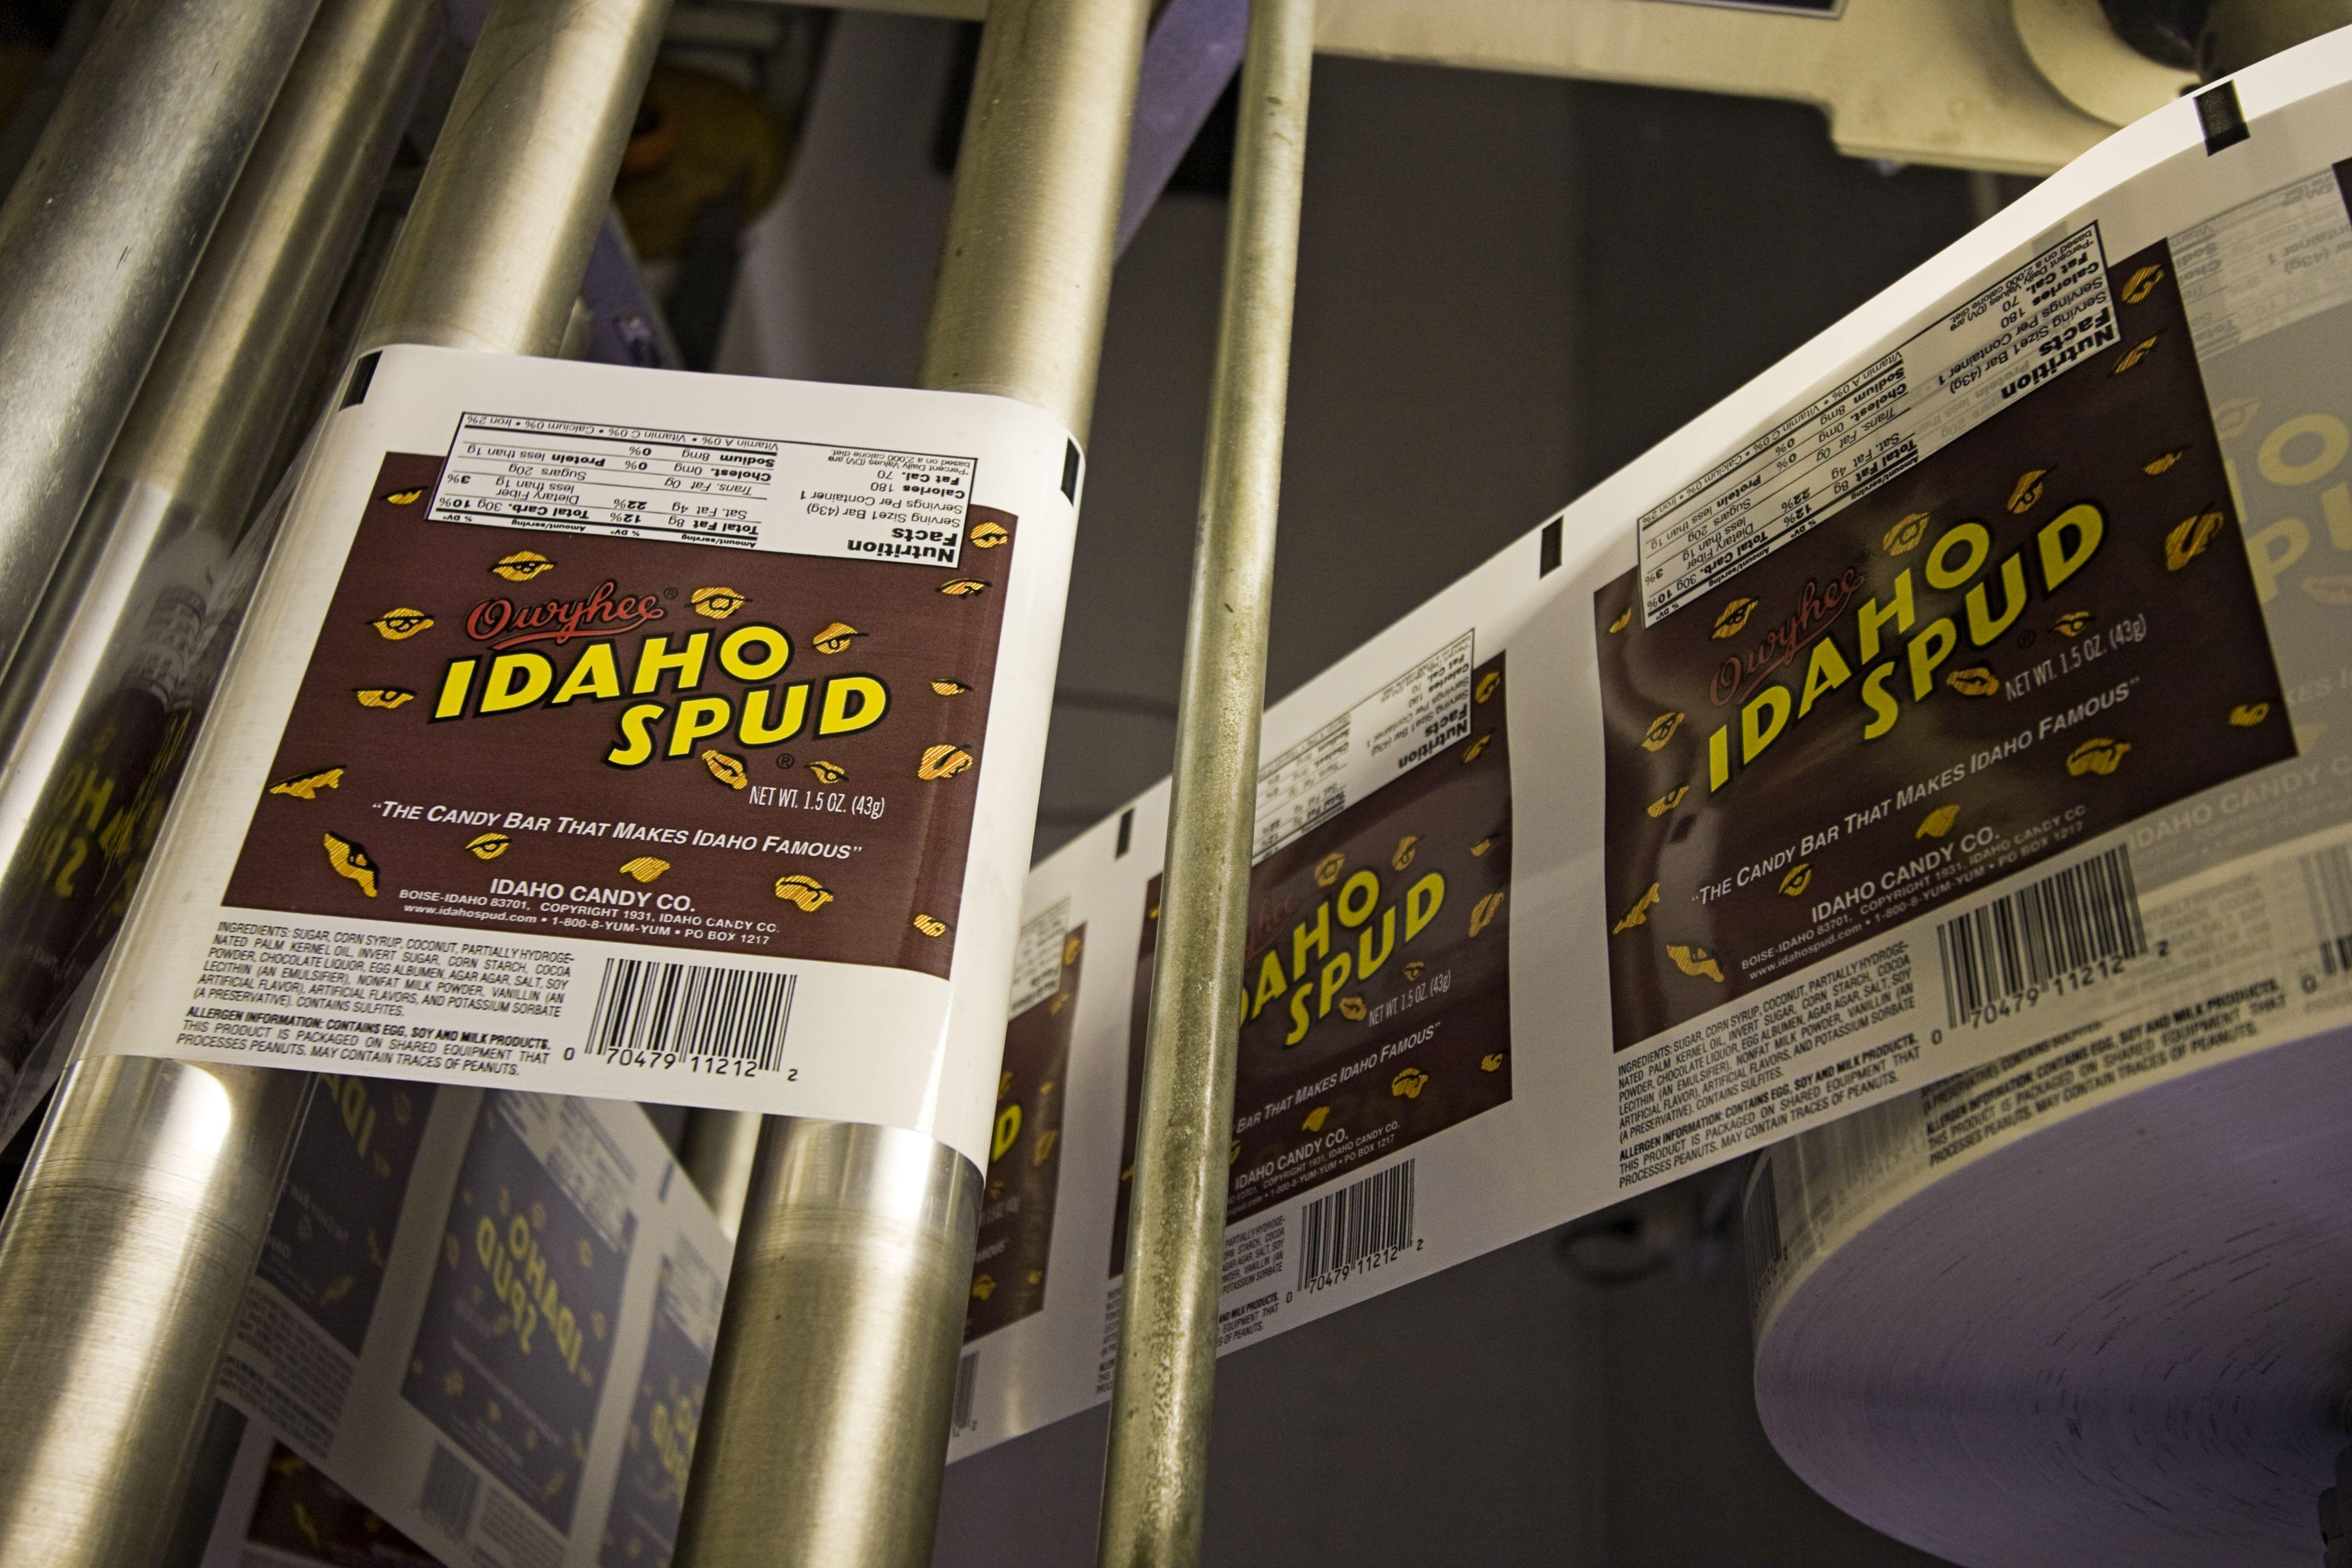 Machinery in the Owyhee Idaho Candy Company of Boise, Idaho, USA